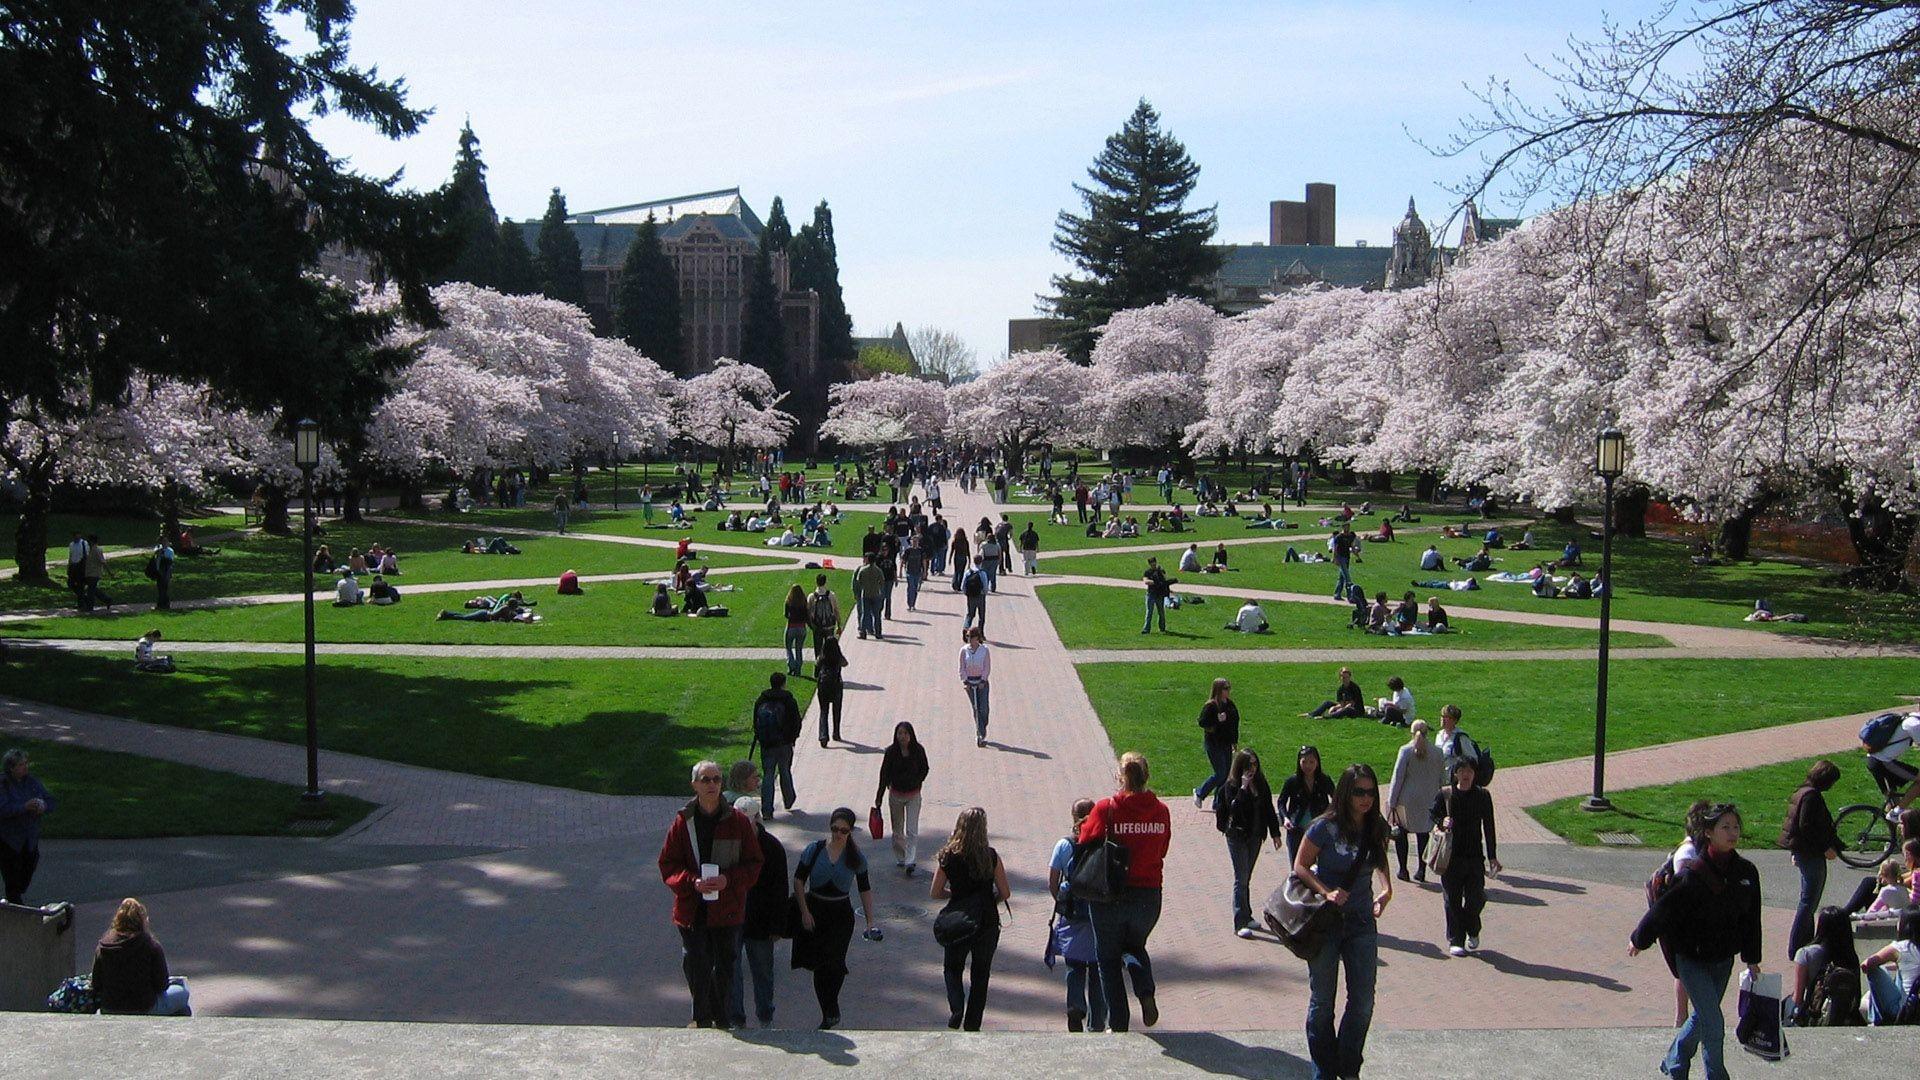 University Of Washington Wallpaper 70 Images